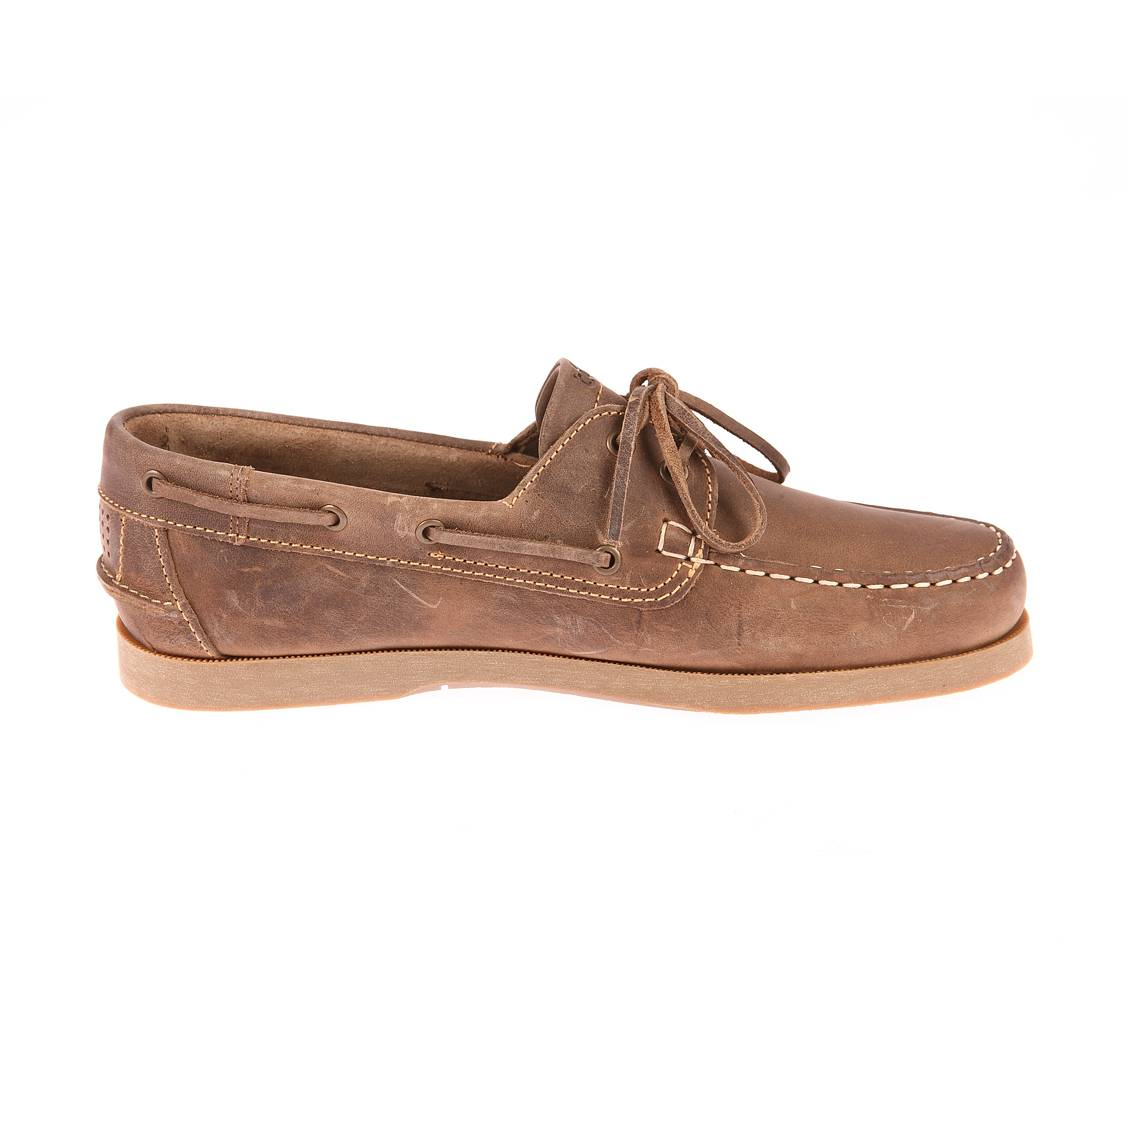 Chaussures Bateau Homme Beige